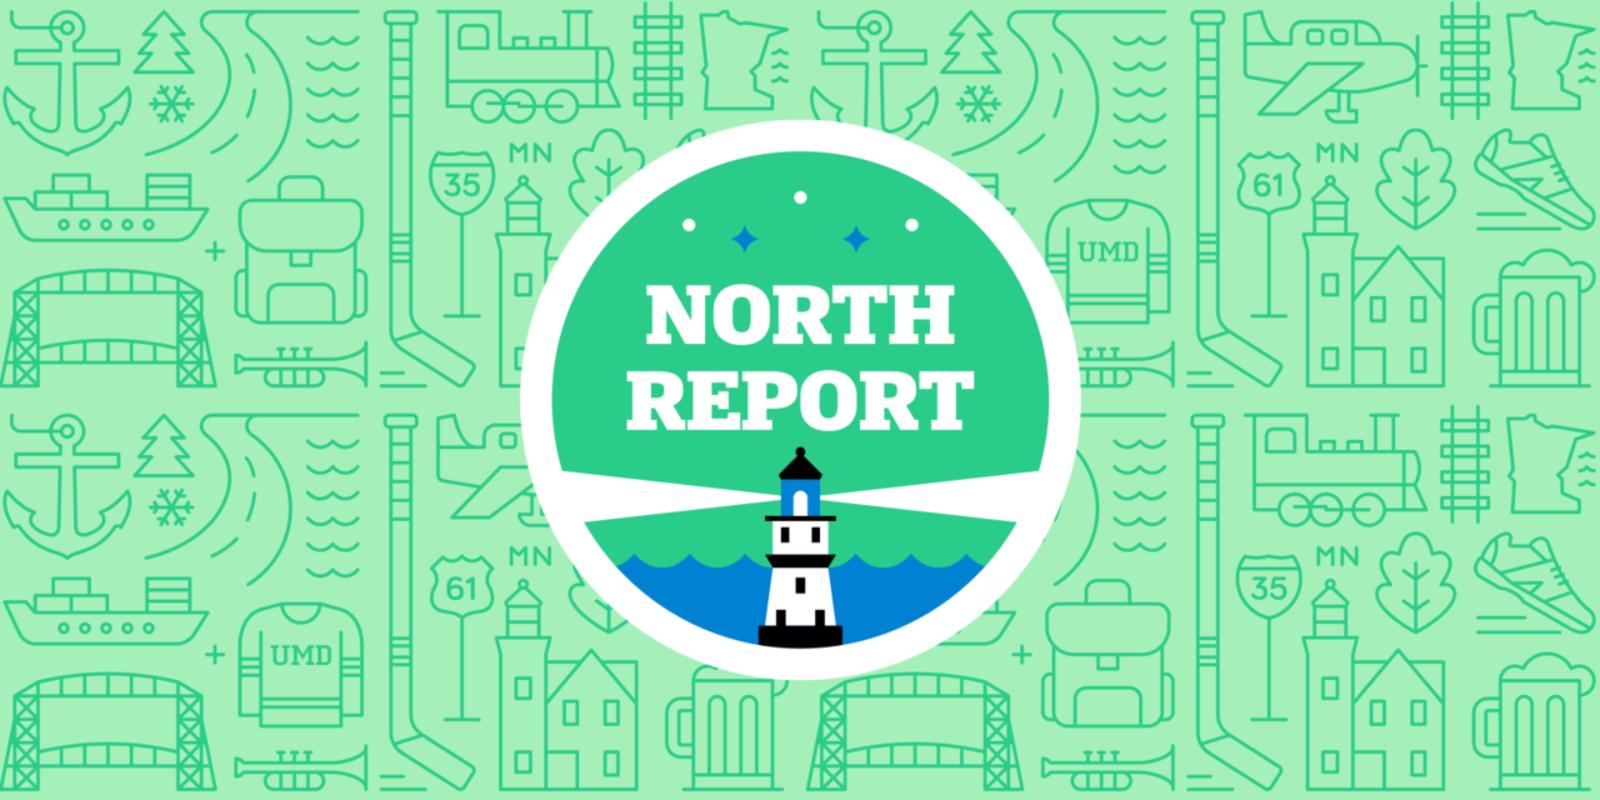 North Report